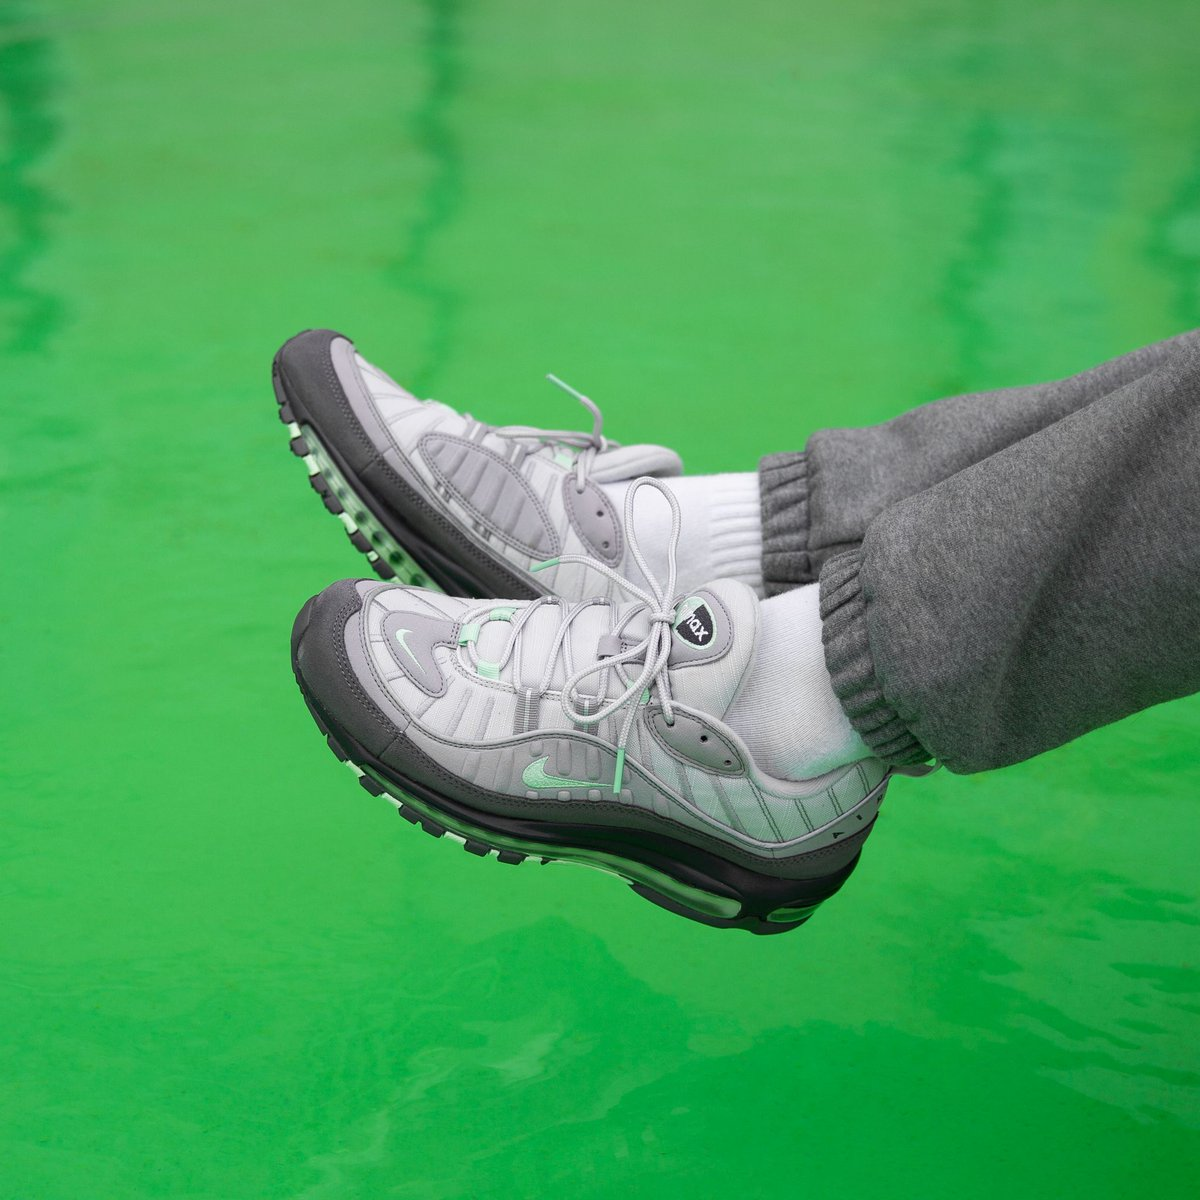 Nike Air Max 98 Vast grey Fresh mint